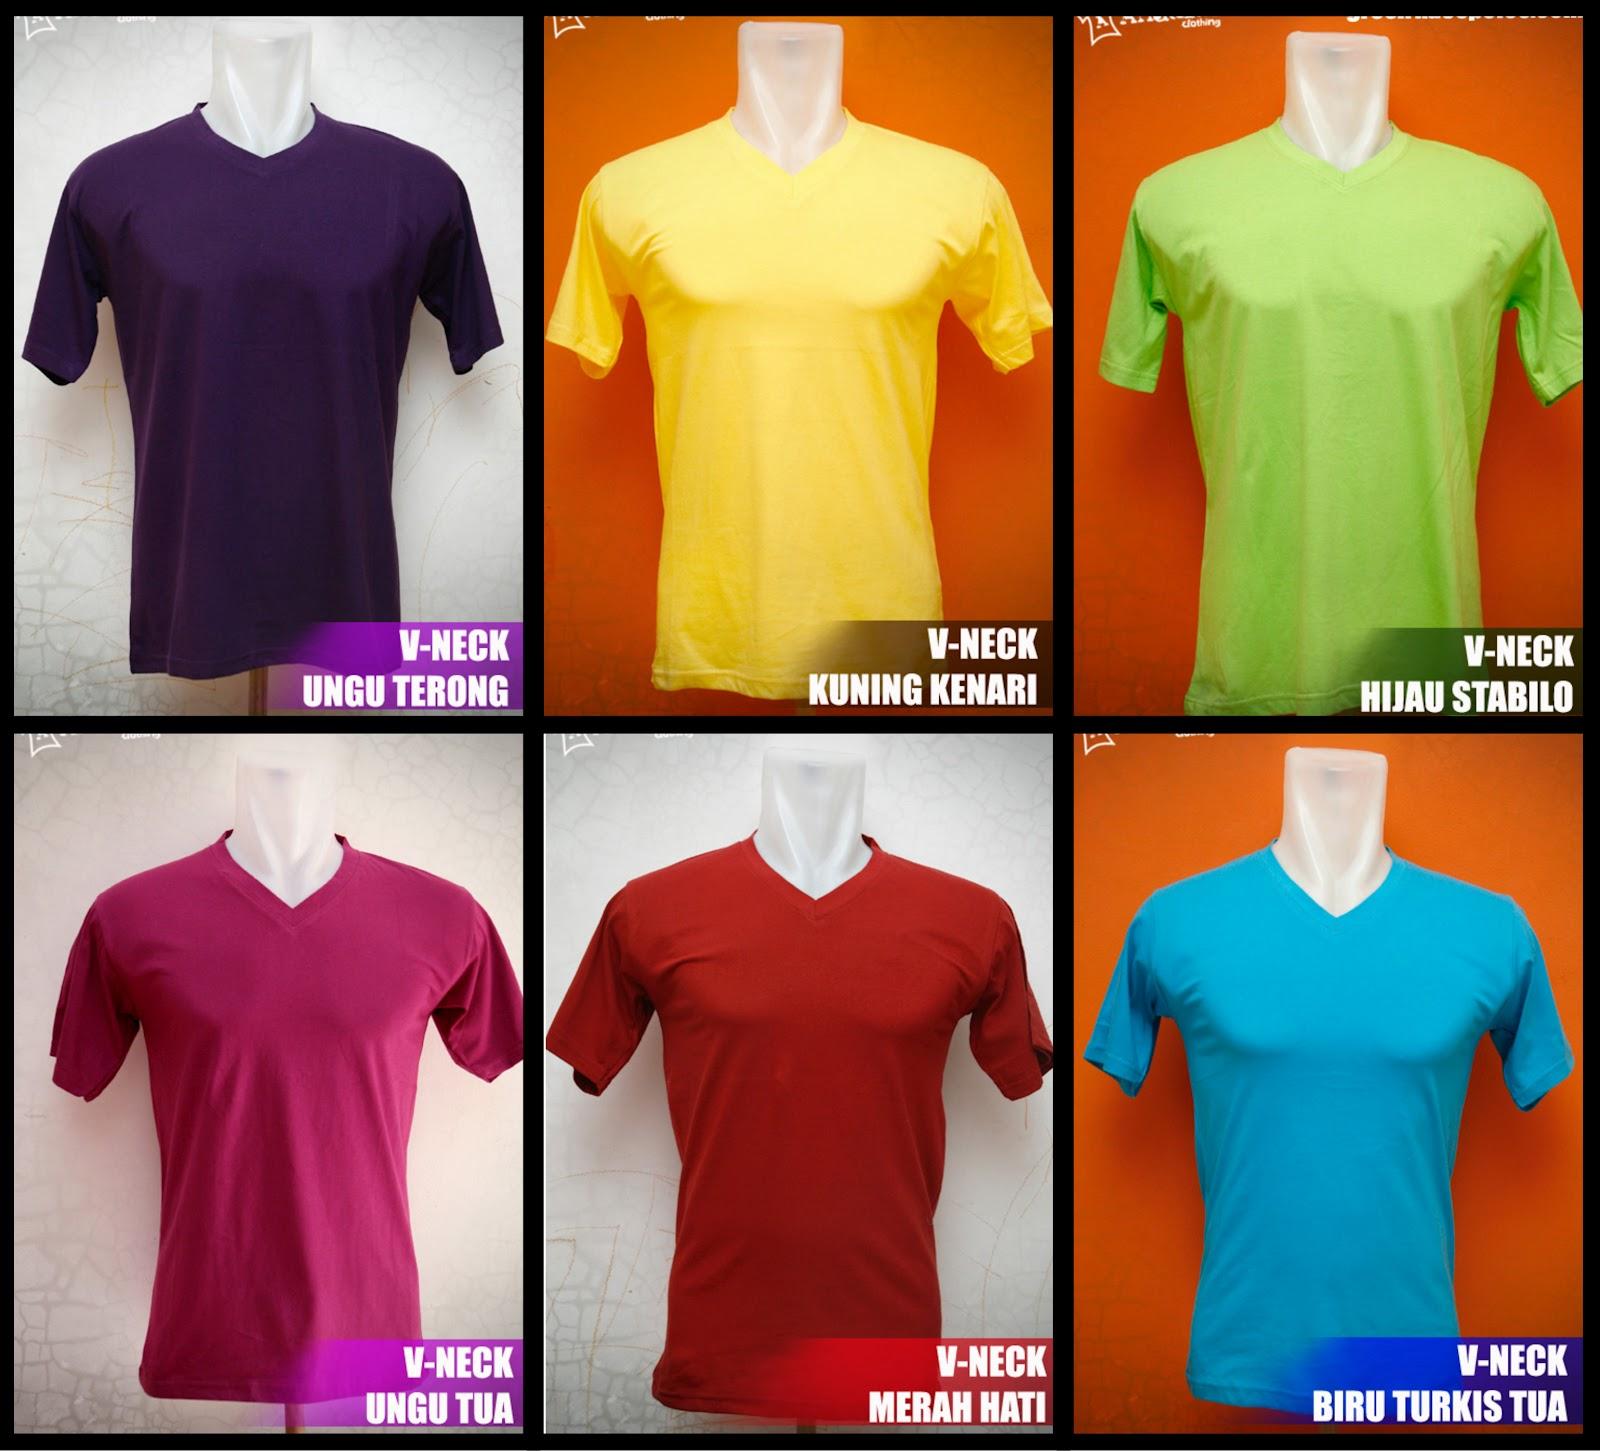 Desain Baju Online V Neck Cotton Combed 20s N 30s Kaos Polos Coklat